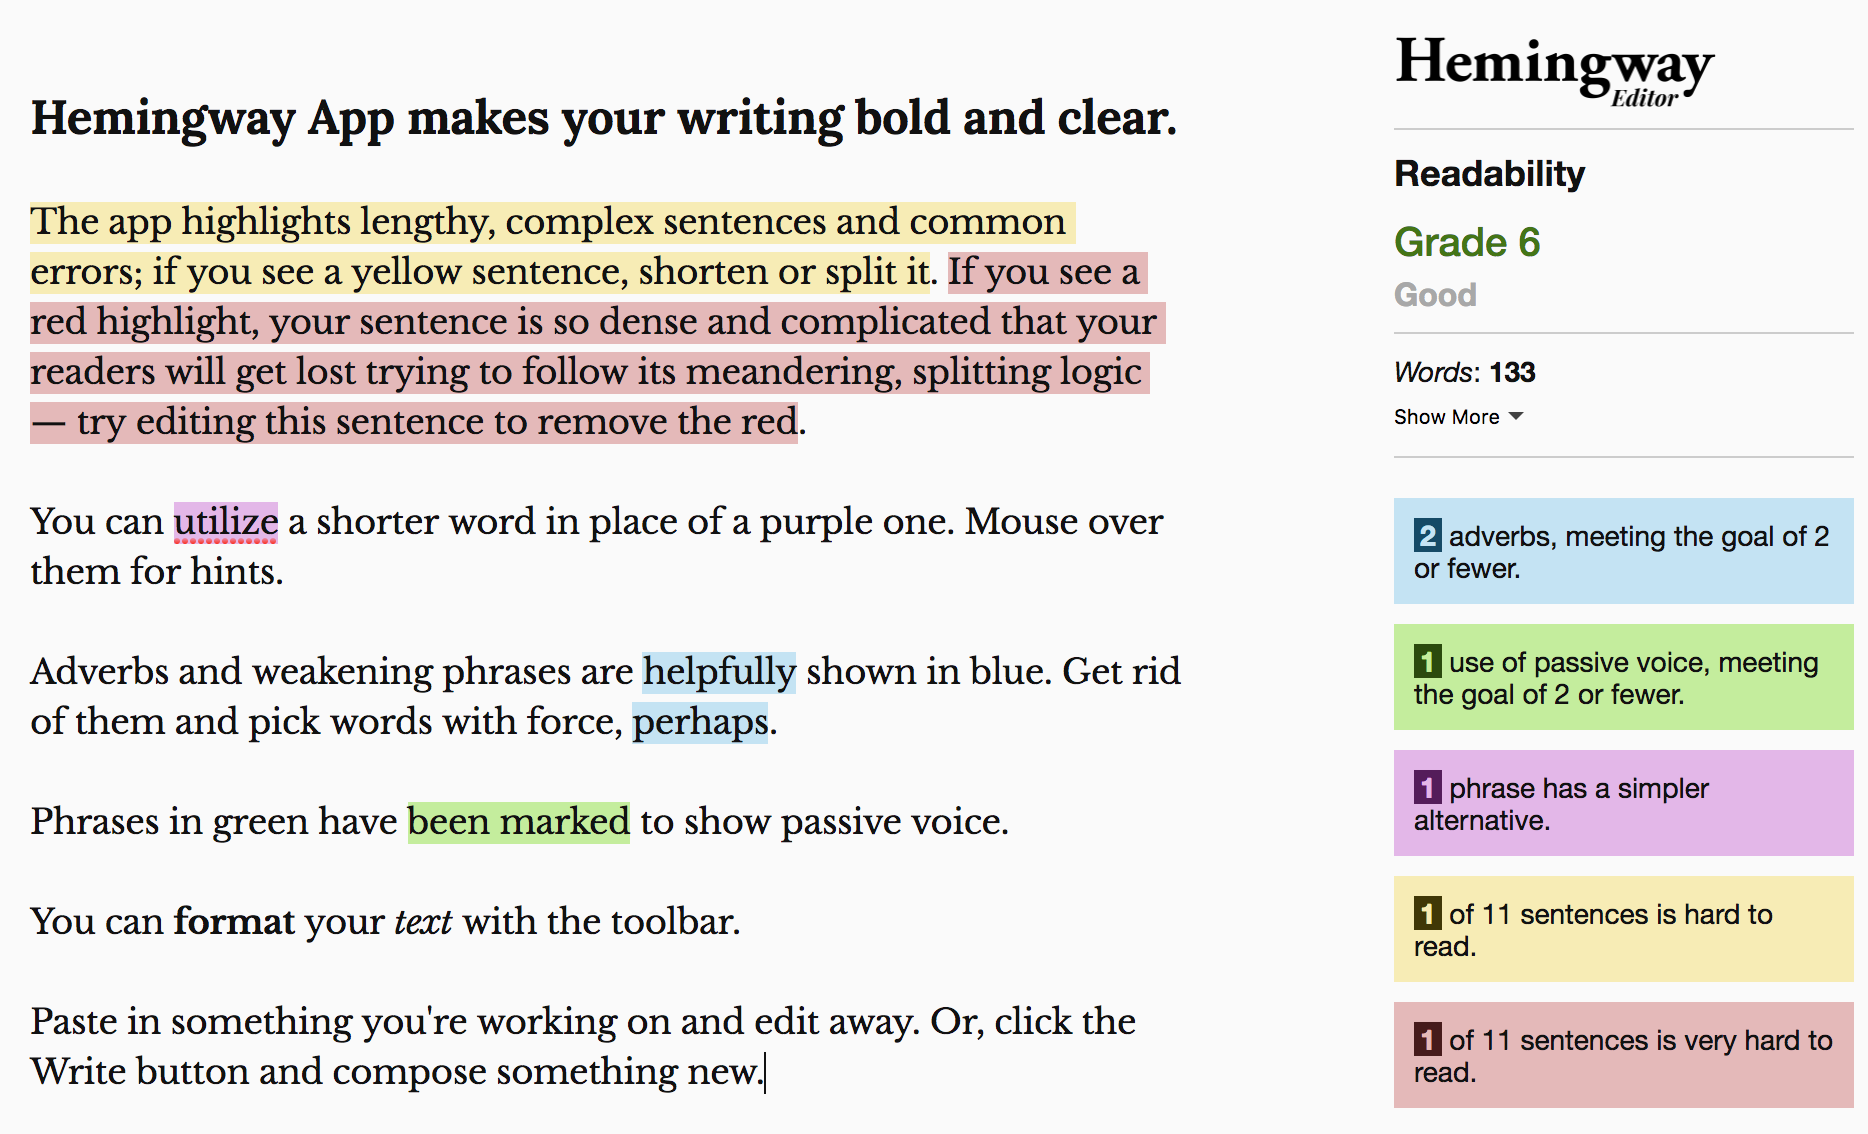 Check your SEO readability using the Hemingway App